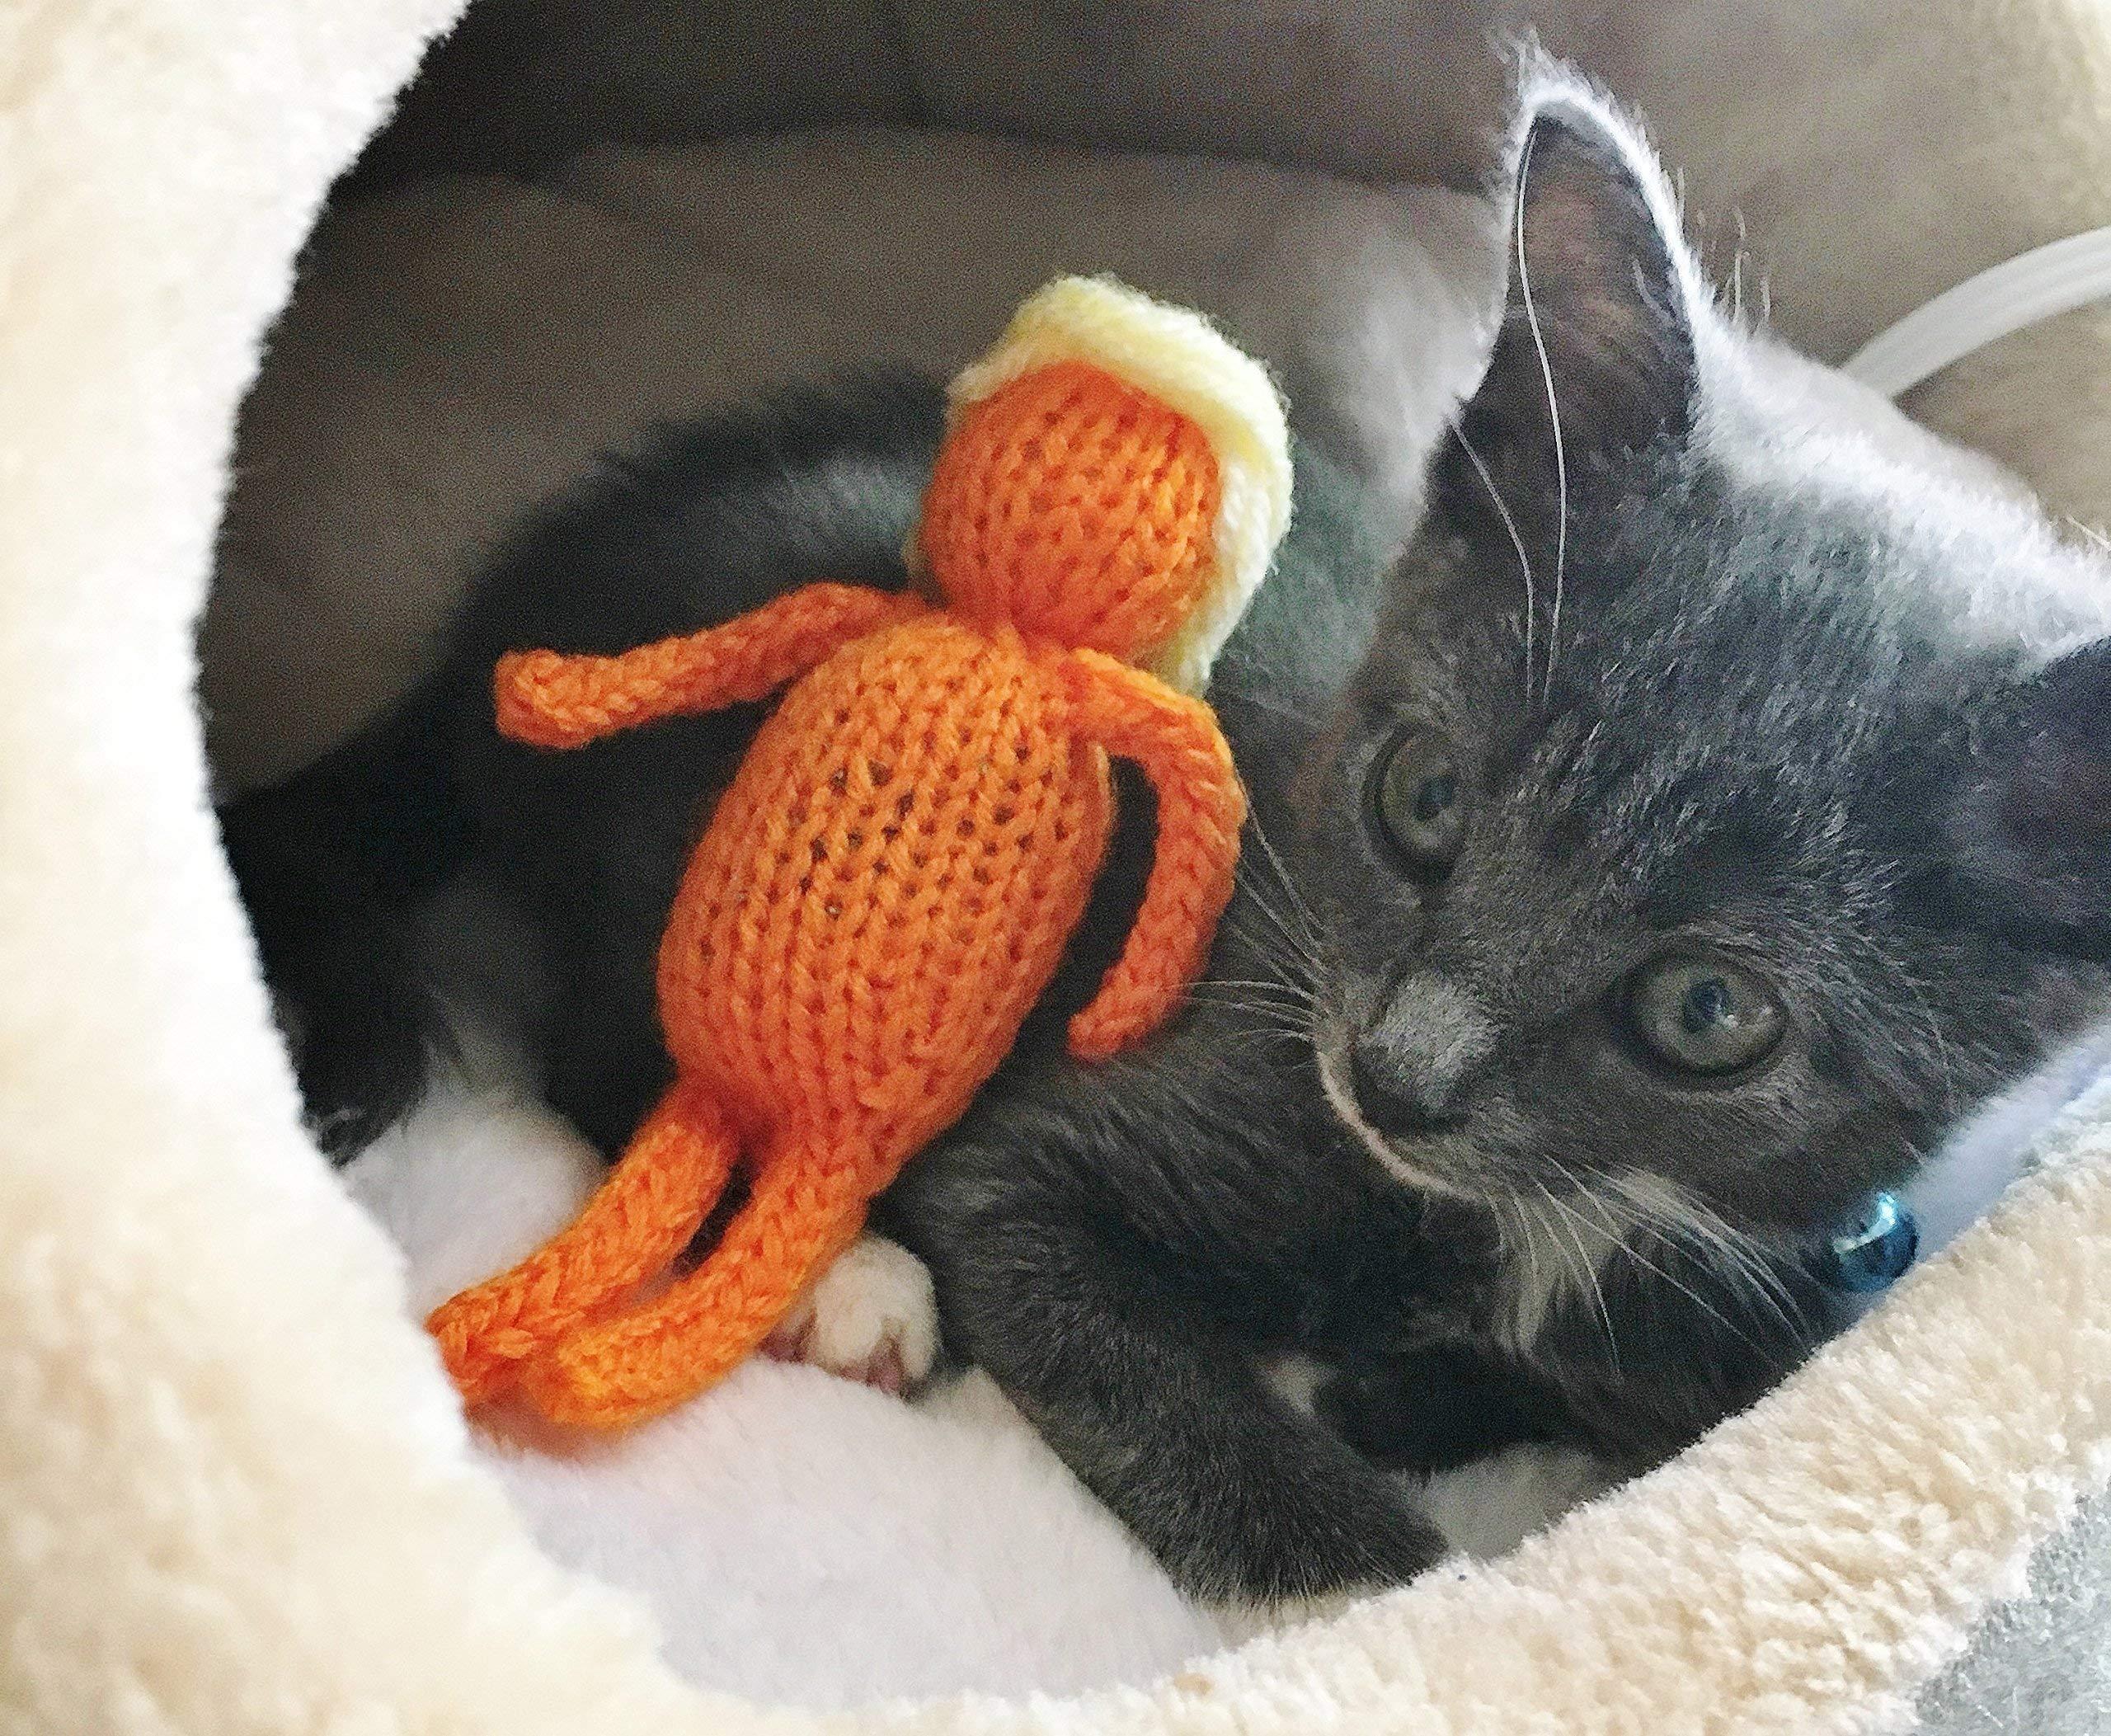 Trump Cat Toy, Catnip Trump Toy, Resist, Not My President